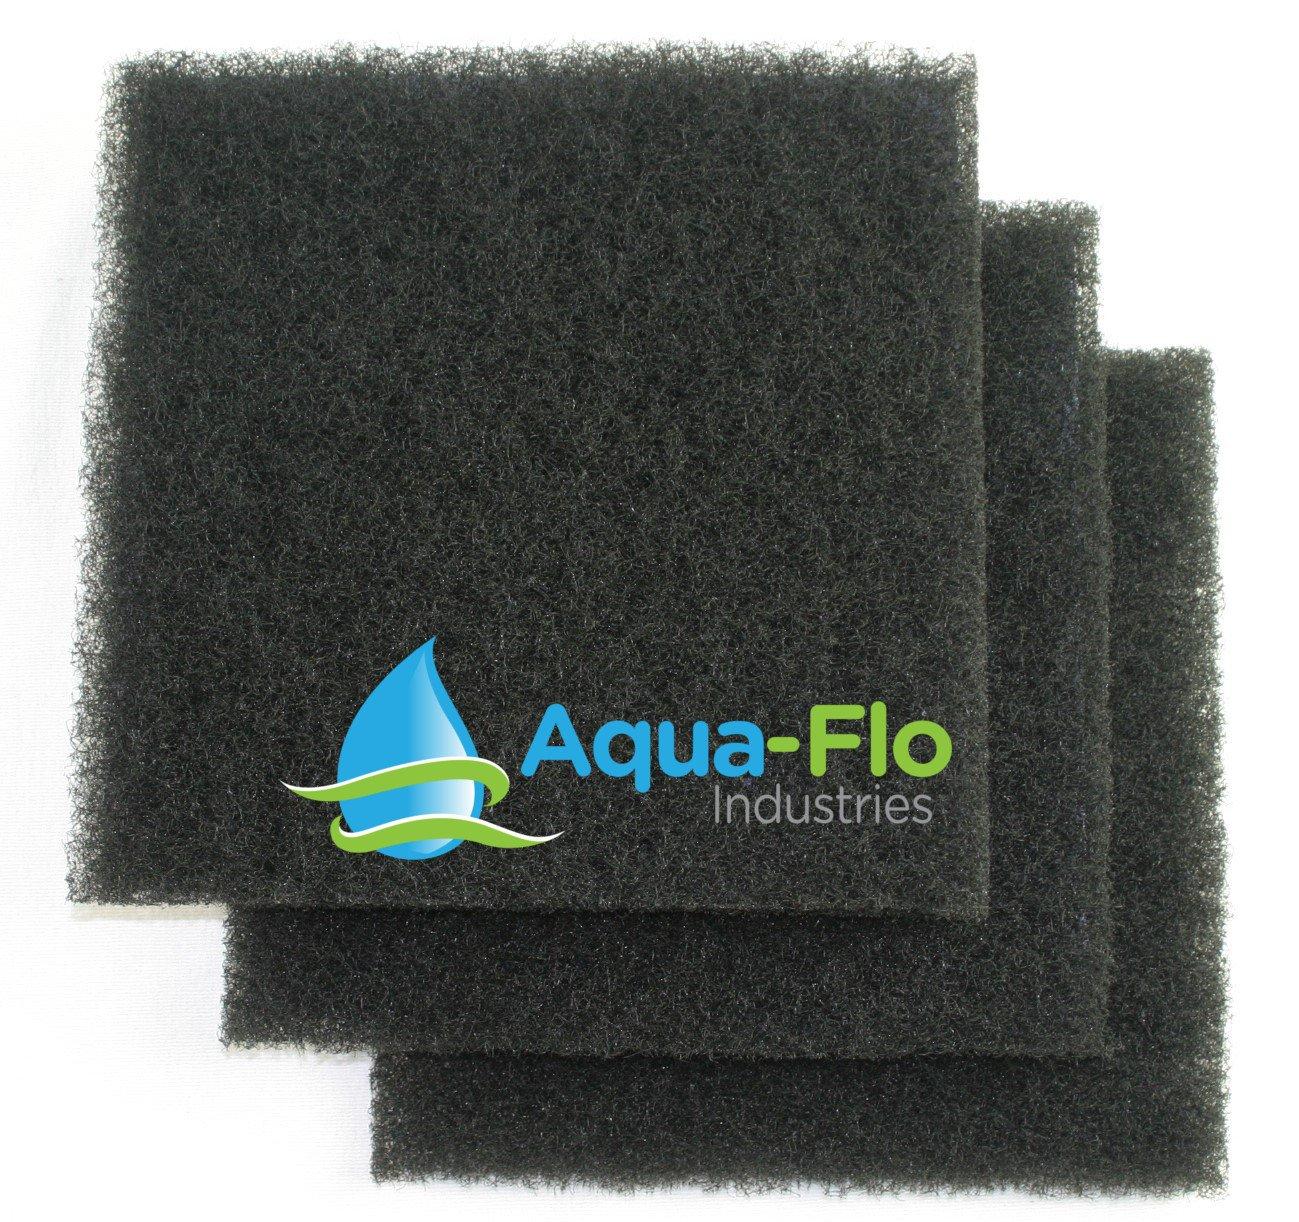 12''x 12''x 1.25'' (3 Pack) Aqua-Flo Coarse Black Universal Pond Filter Mat by Aqua Flo (Image #1)